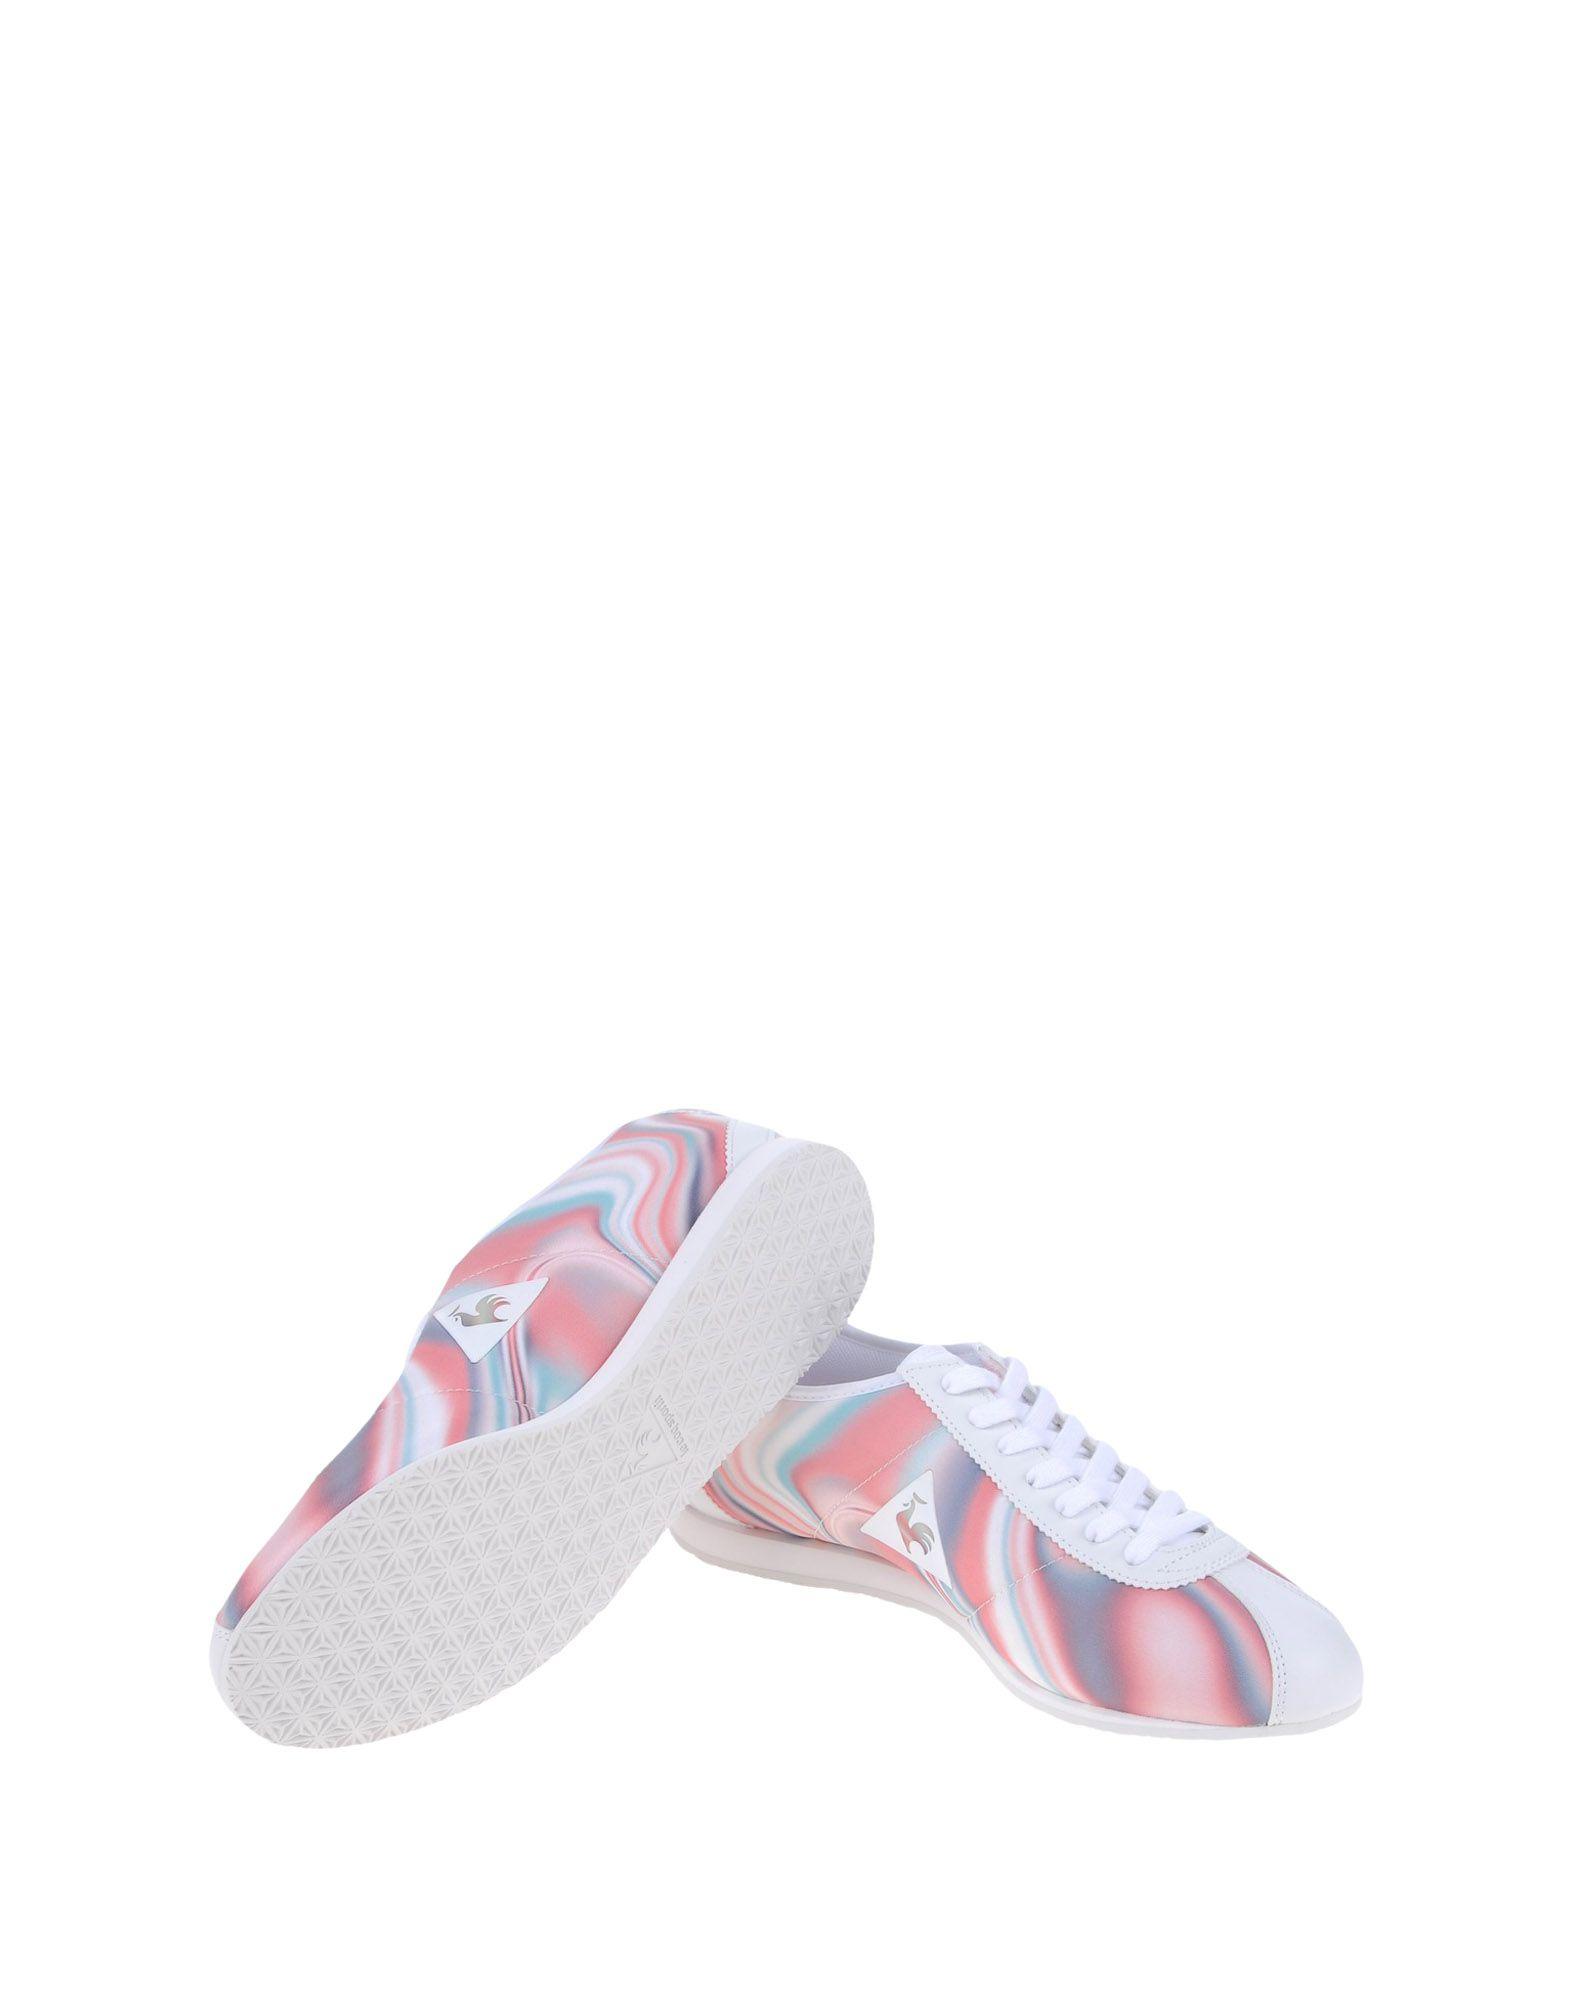 Sneakers Le Coq Sportif Wendon W Blurred - Femme - Sneakers Le Coq Sportif sur